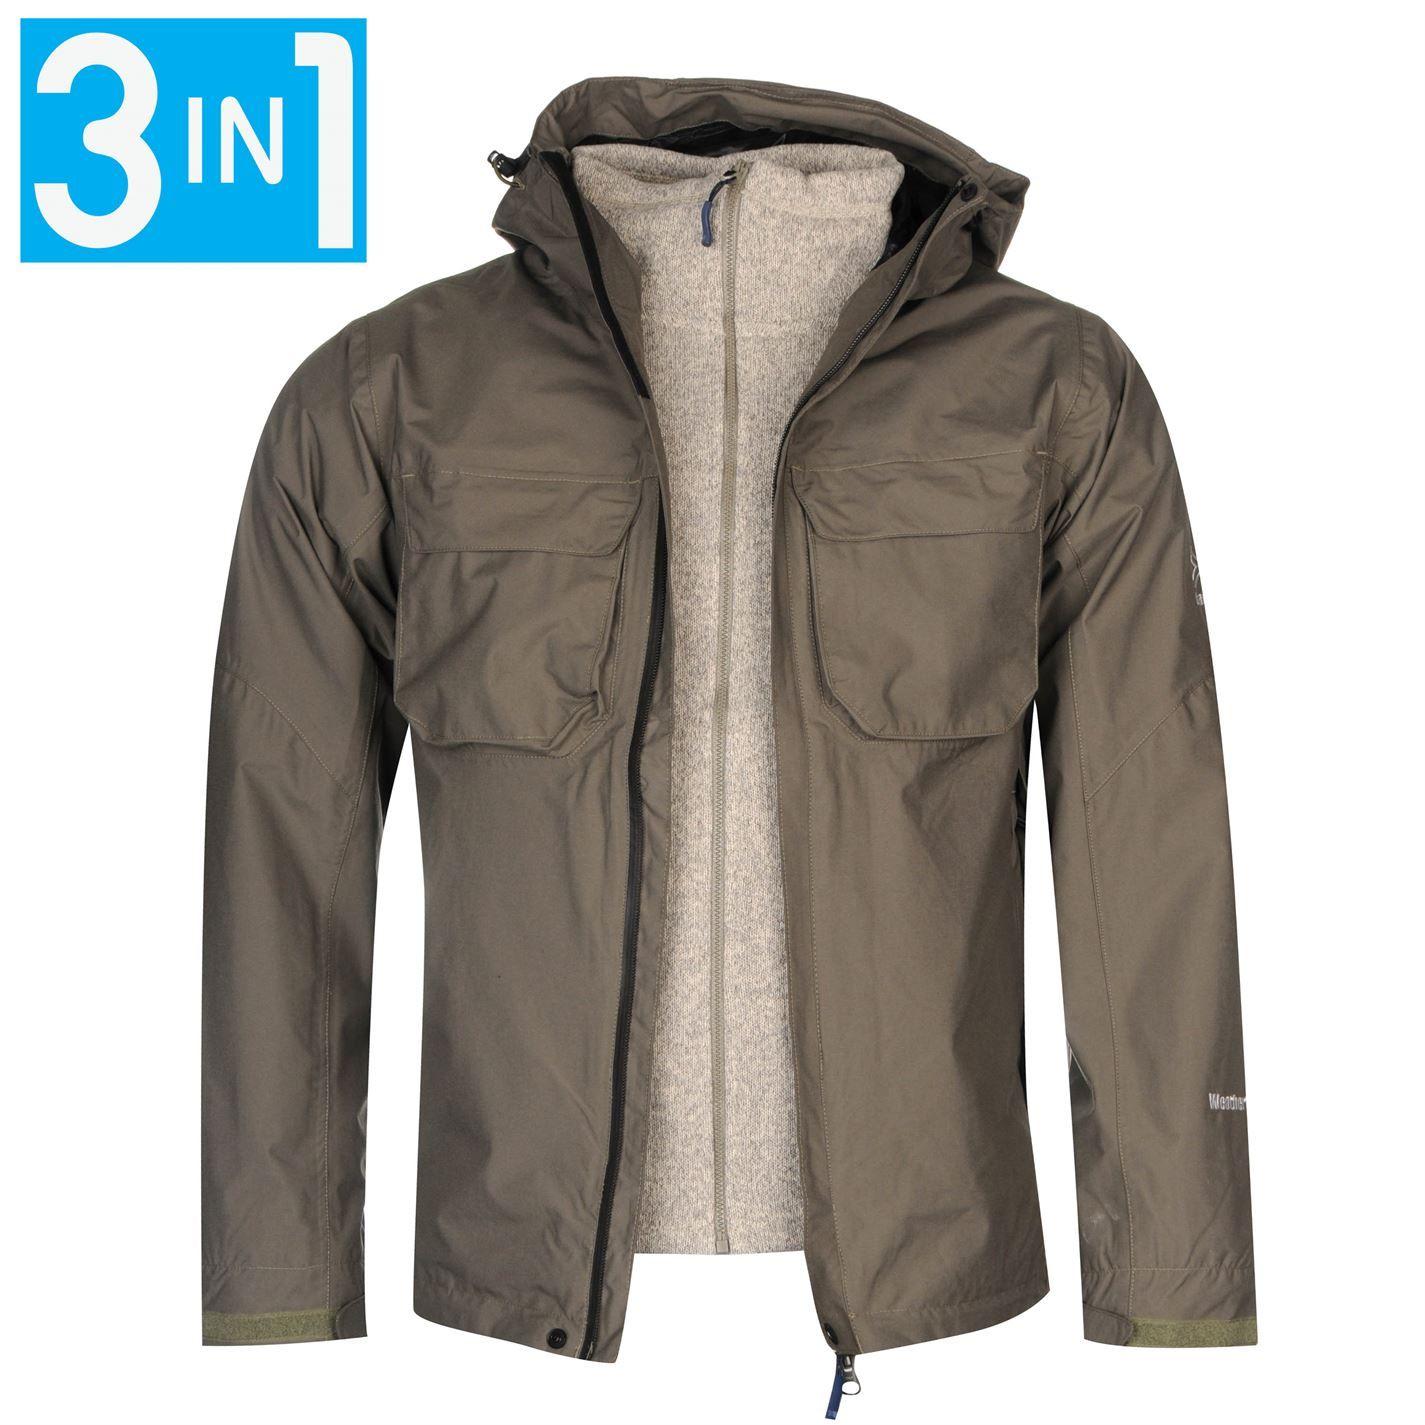 Karrimor | Karrimor Tycoon 3 in 1 Jacket Mens | Mens Jackets and ...